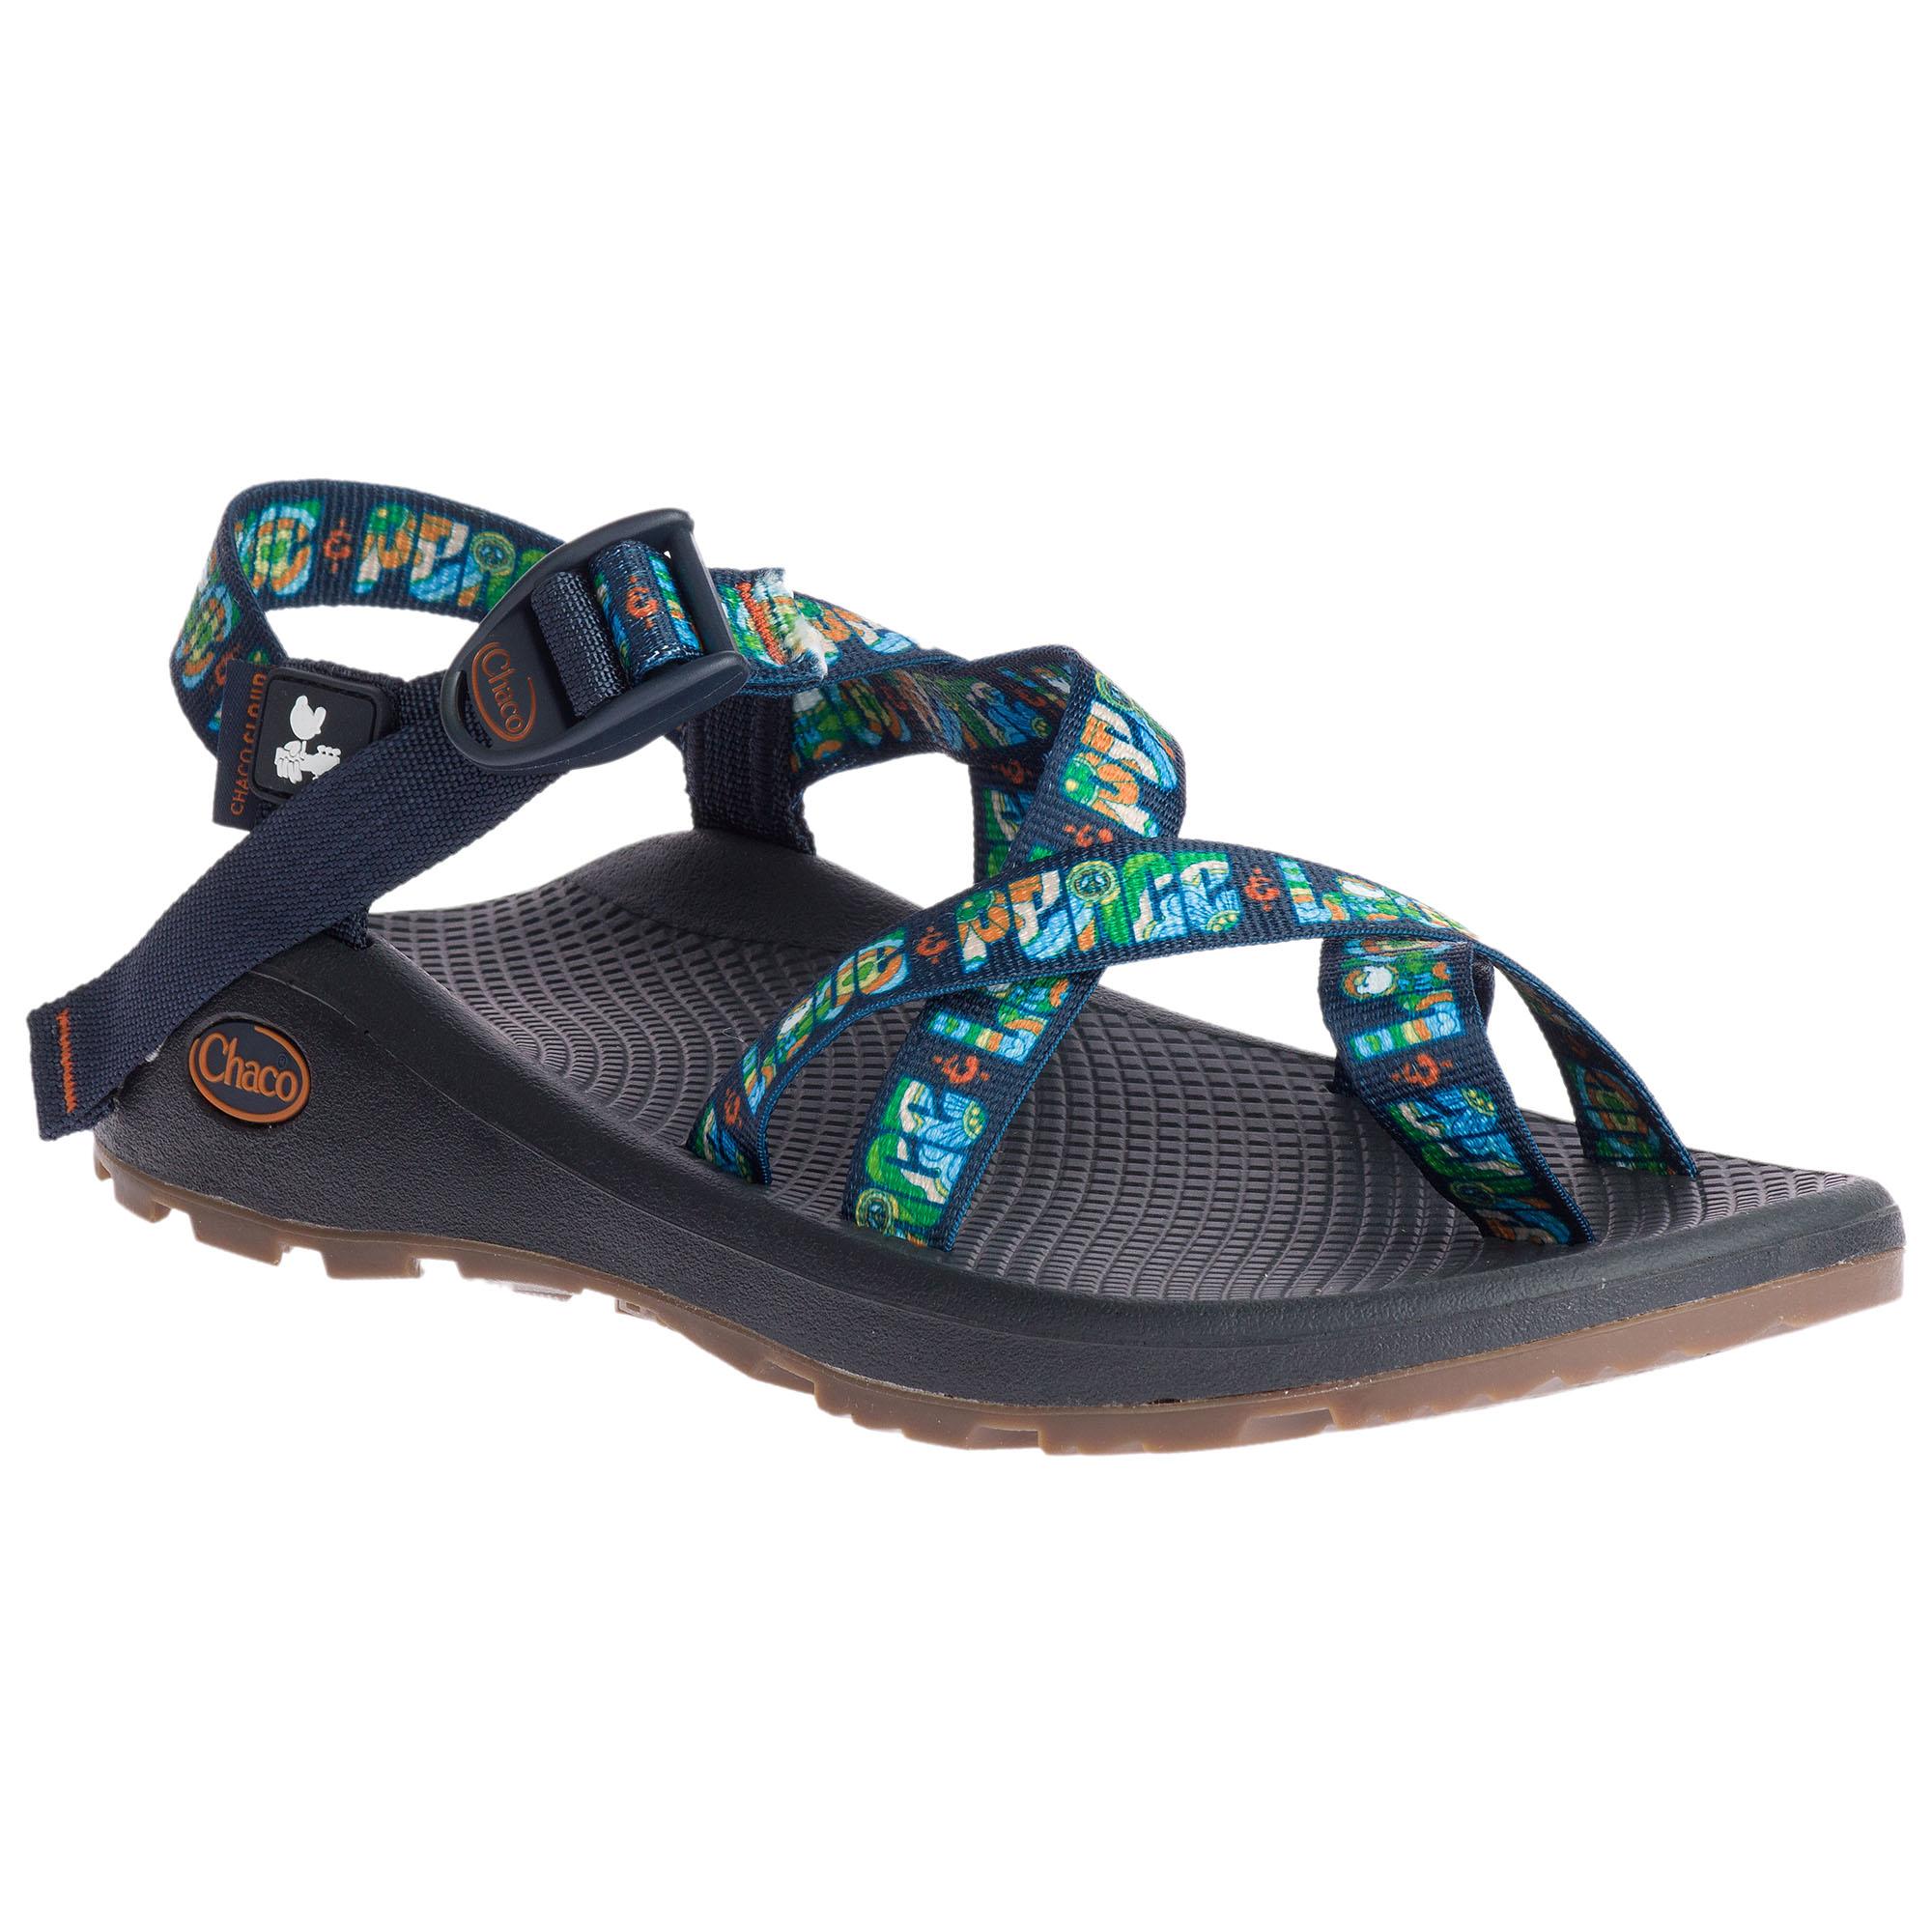 94ff50460597 Chaco Men s Z Cloud 2 Woodstock Sandals - Sun   Ski Sports